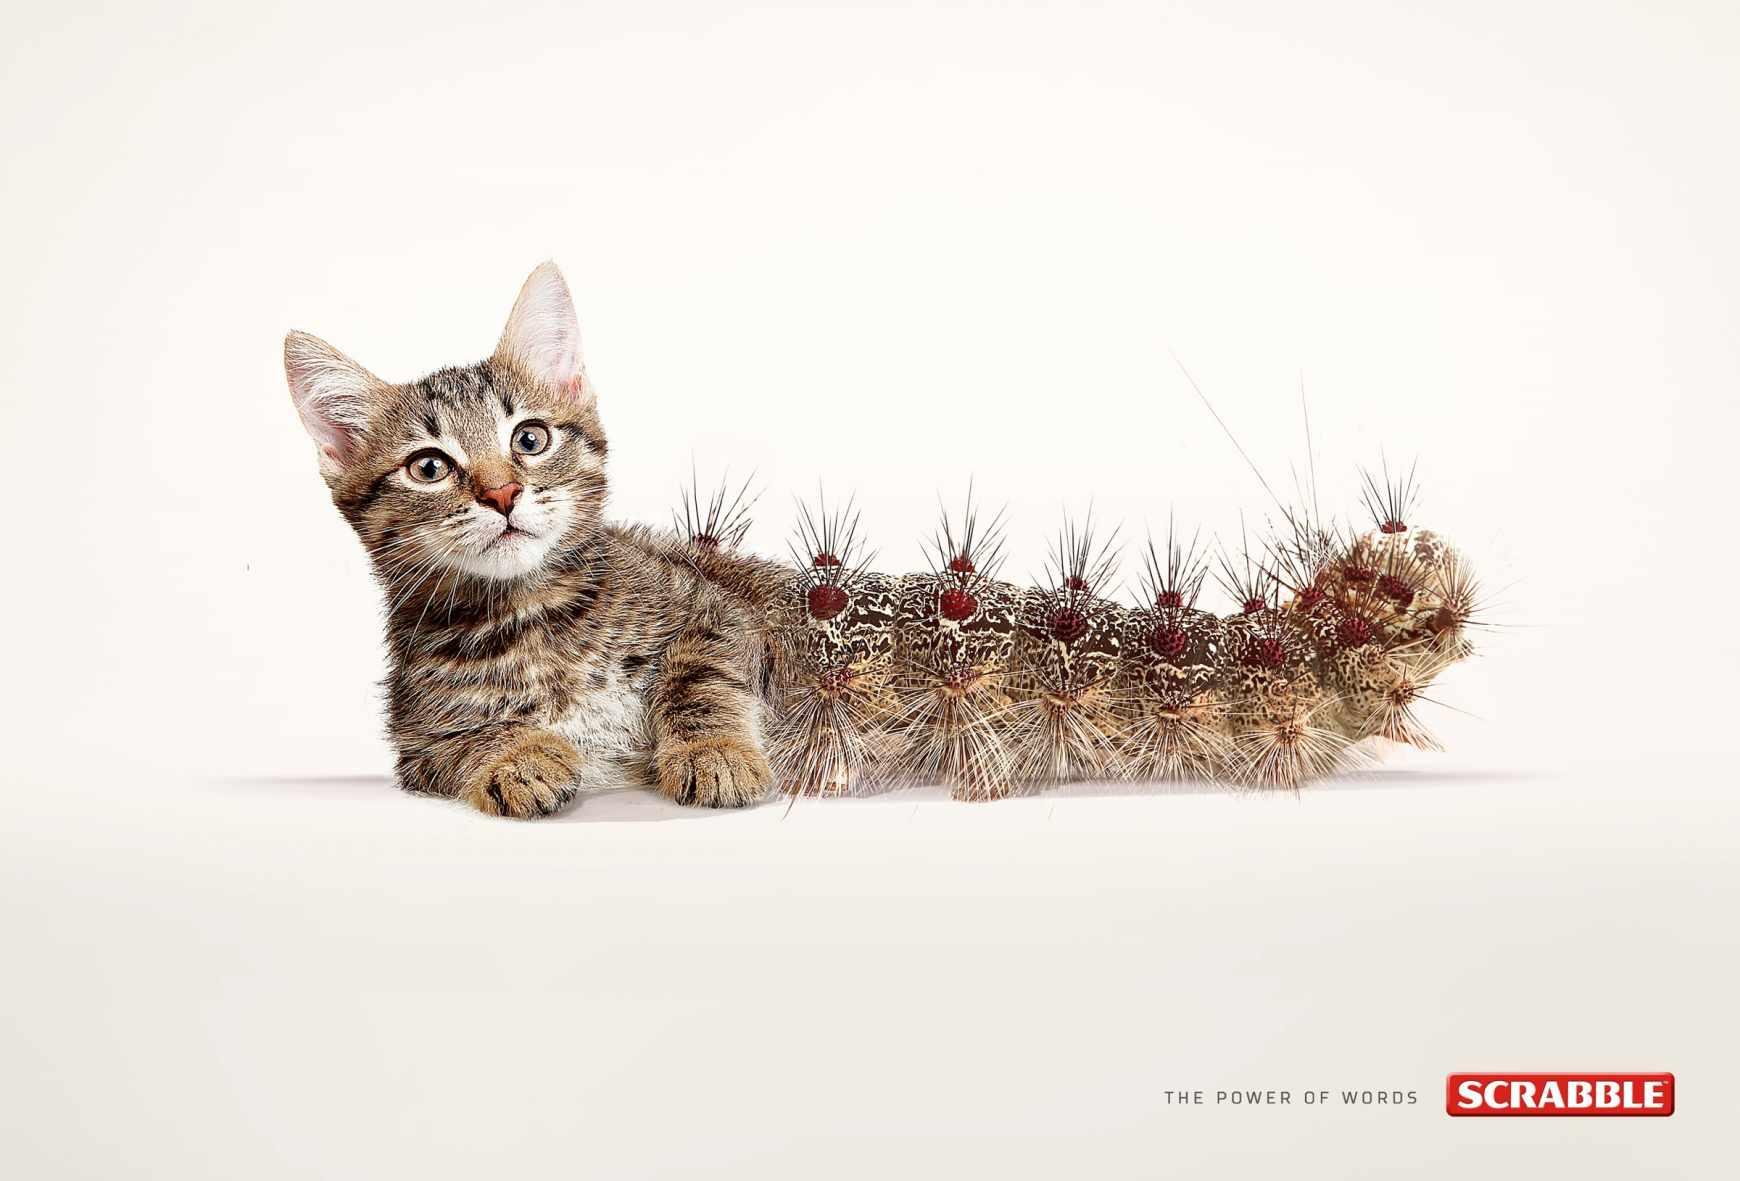 cat-erpillar